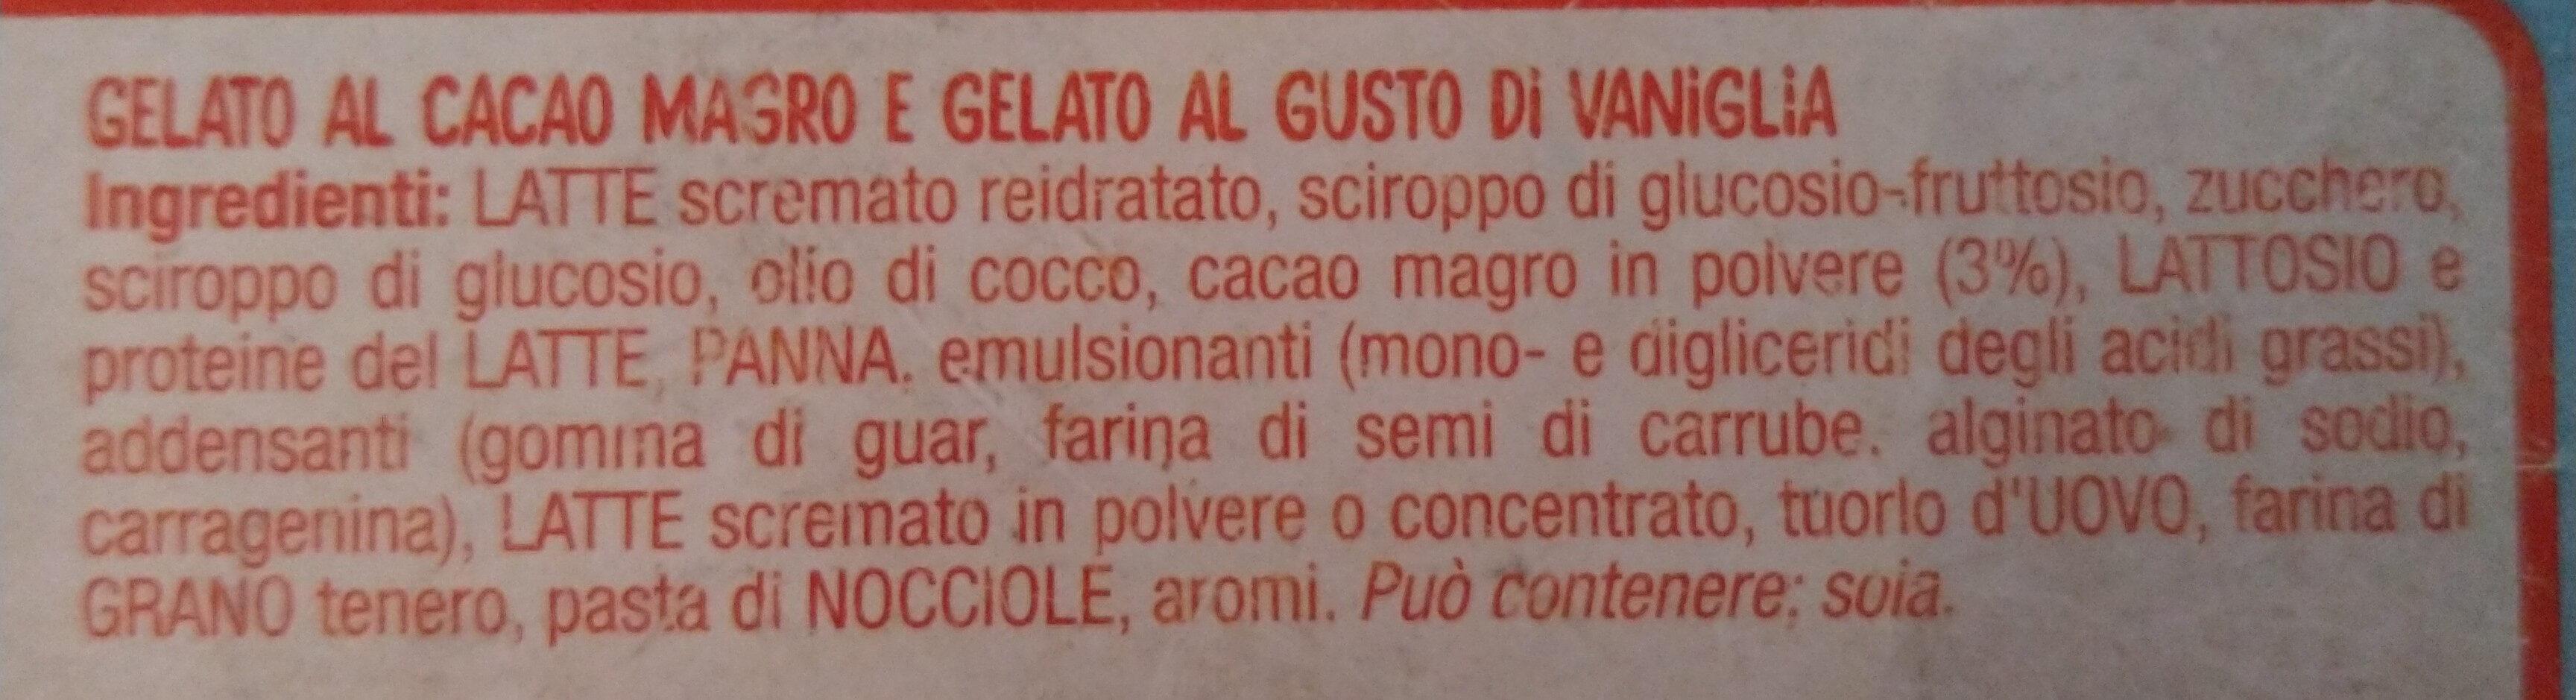 gelato tartufo e vaniglia - Ingredients - it